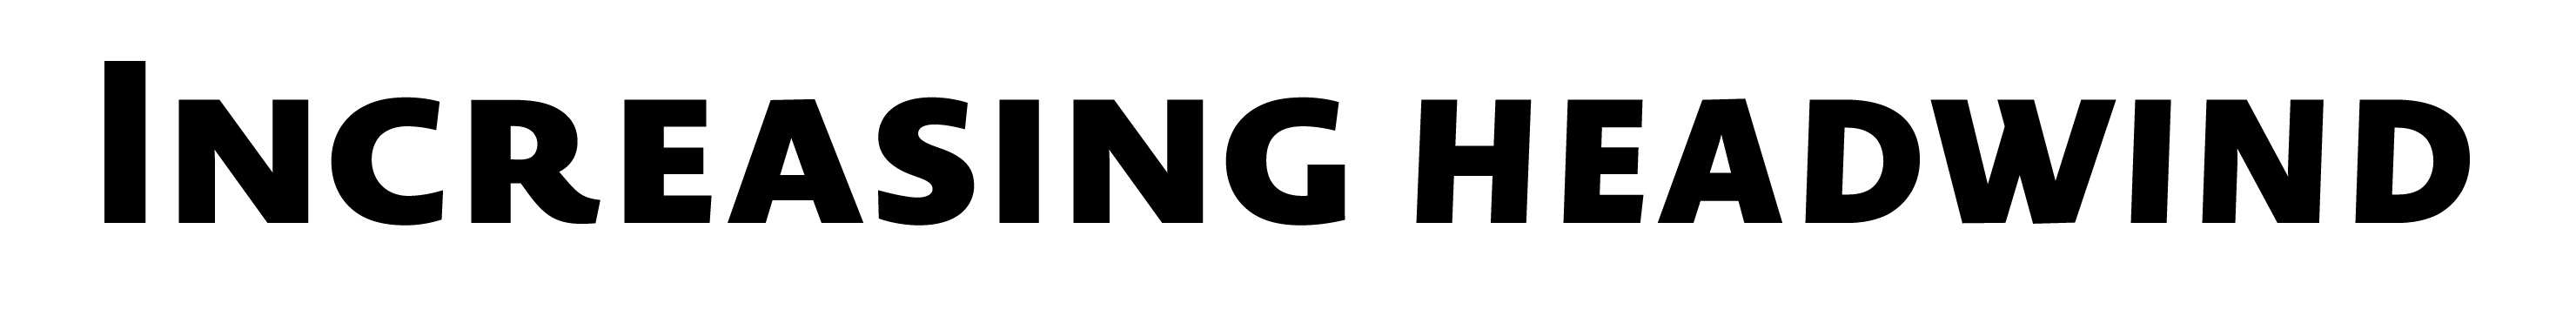 Typeface Novel Sans D12 Atlas Font Foundry